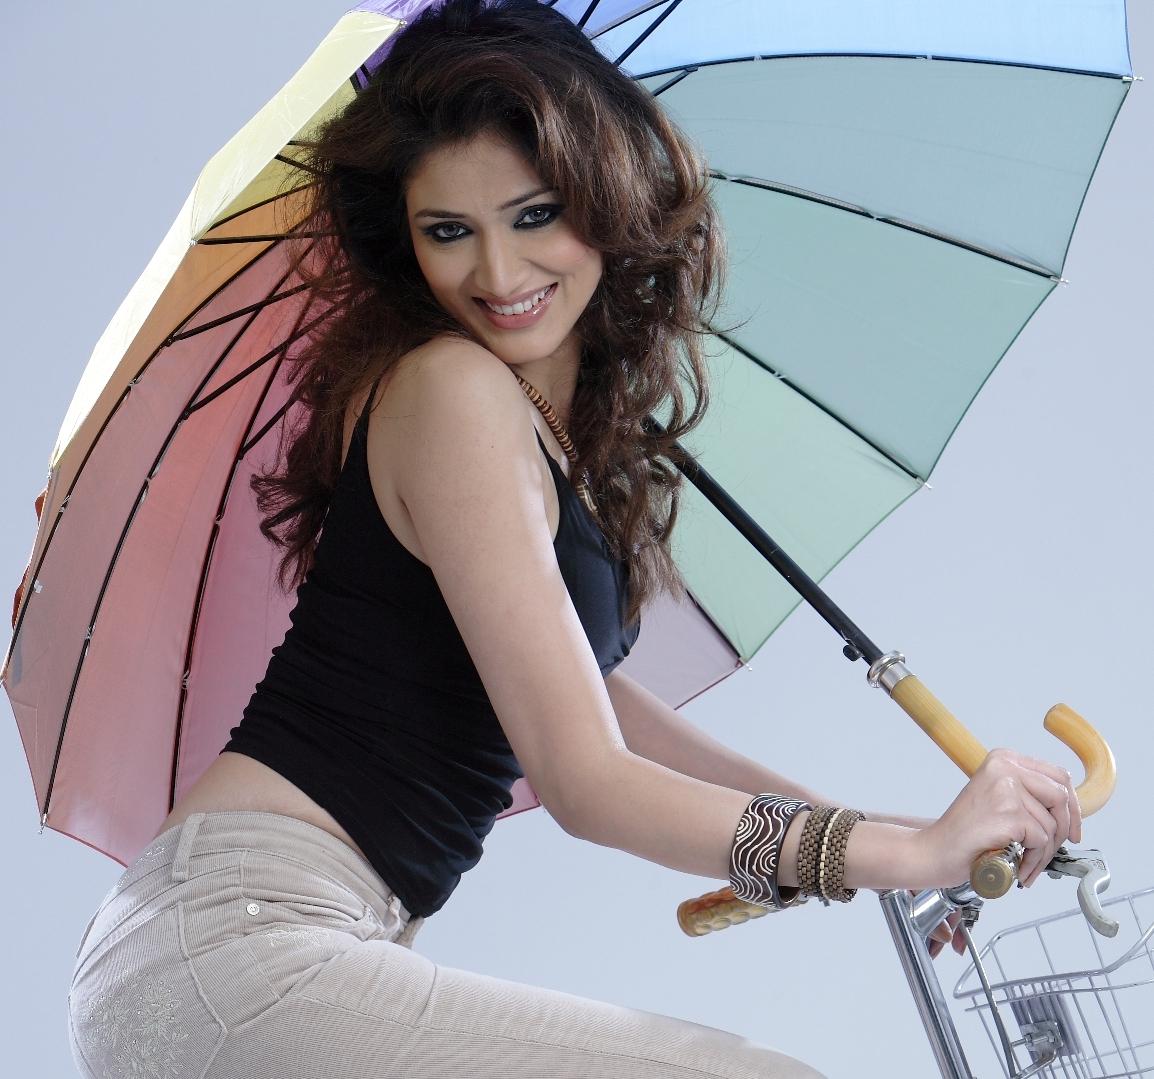 Hot Indian Model Navina Bhatia Hot Photos Bollywood Stars Desi Girlsdesi Boys And Indian Girls Fashion Photos